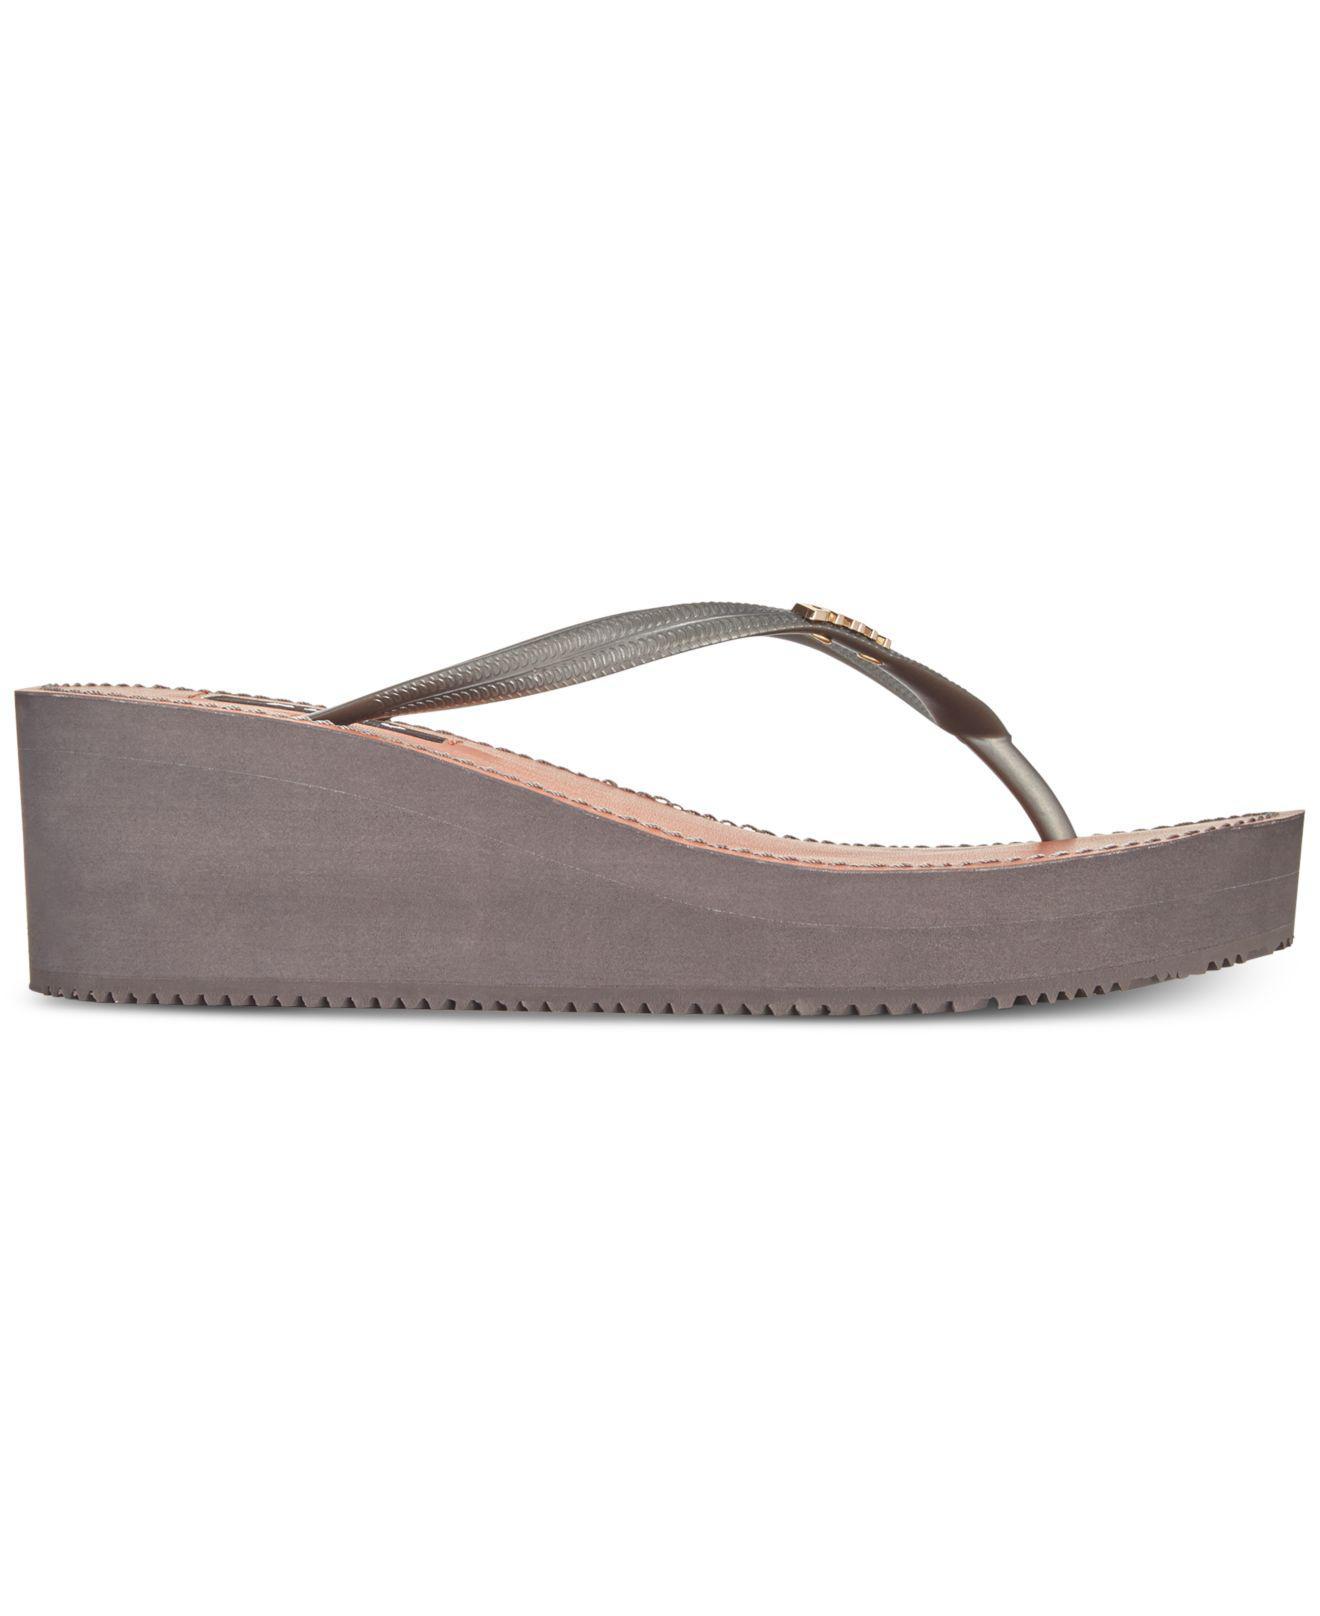 5e1d34e85e67 DKNY - Multicolor Mar Wedge Sandals